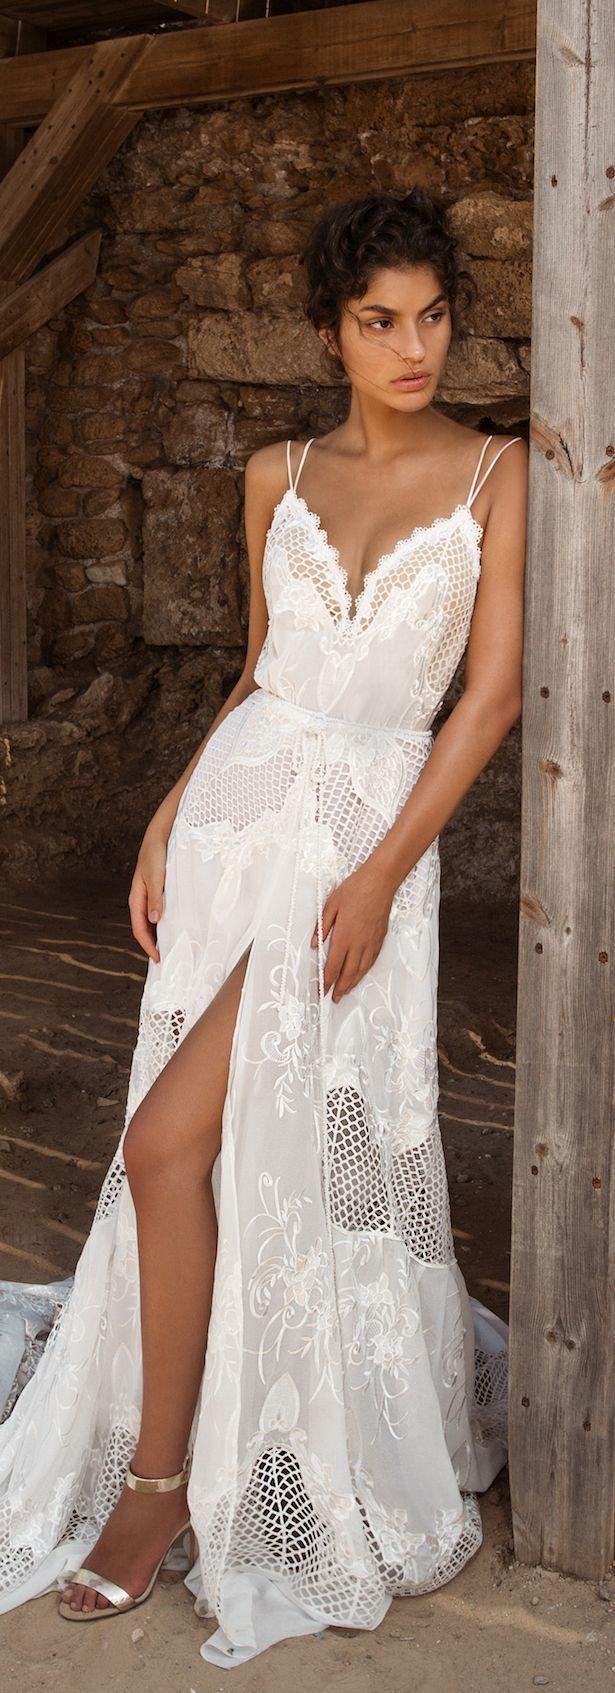 Simple boho wedding dress with spaghetti straps open split skirt